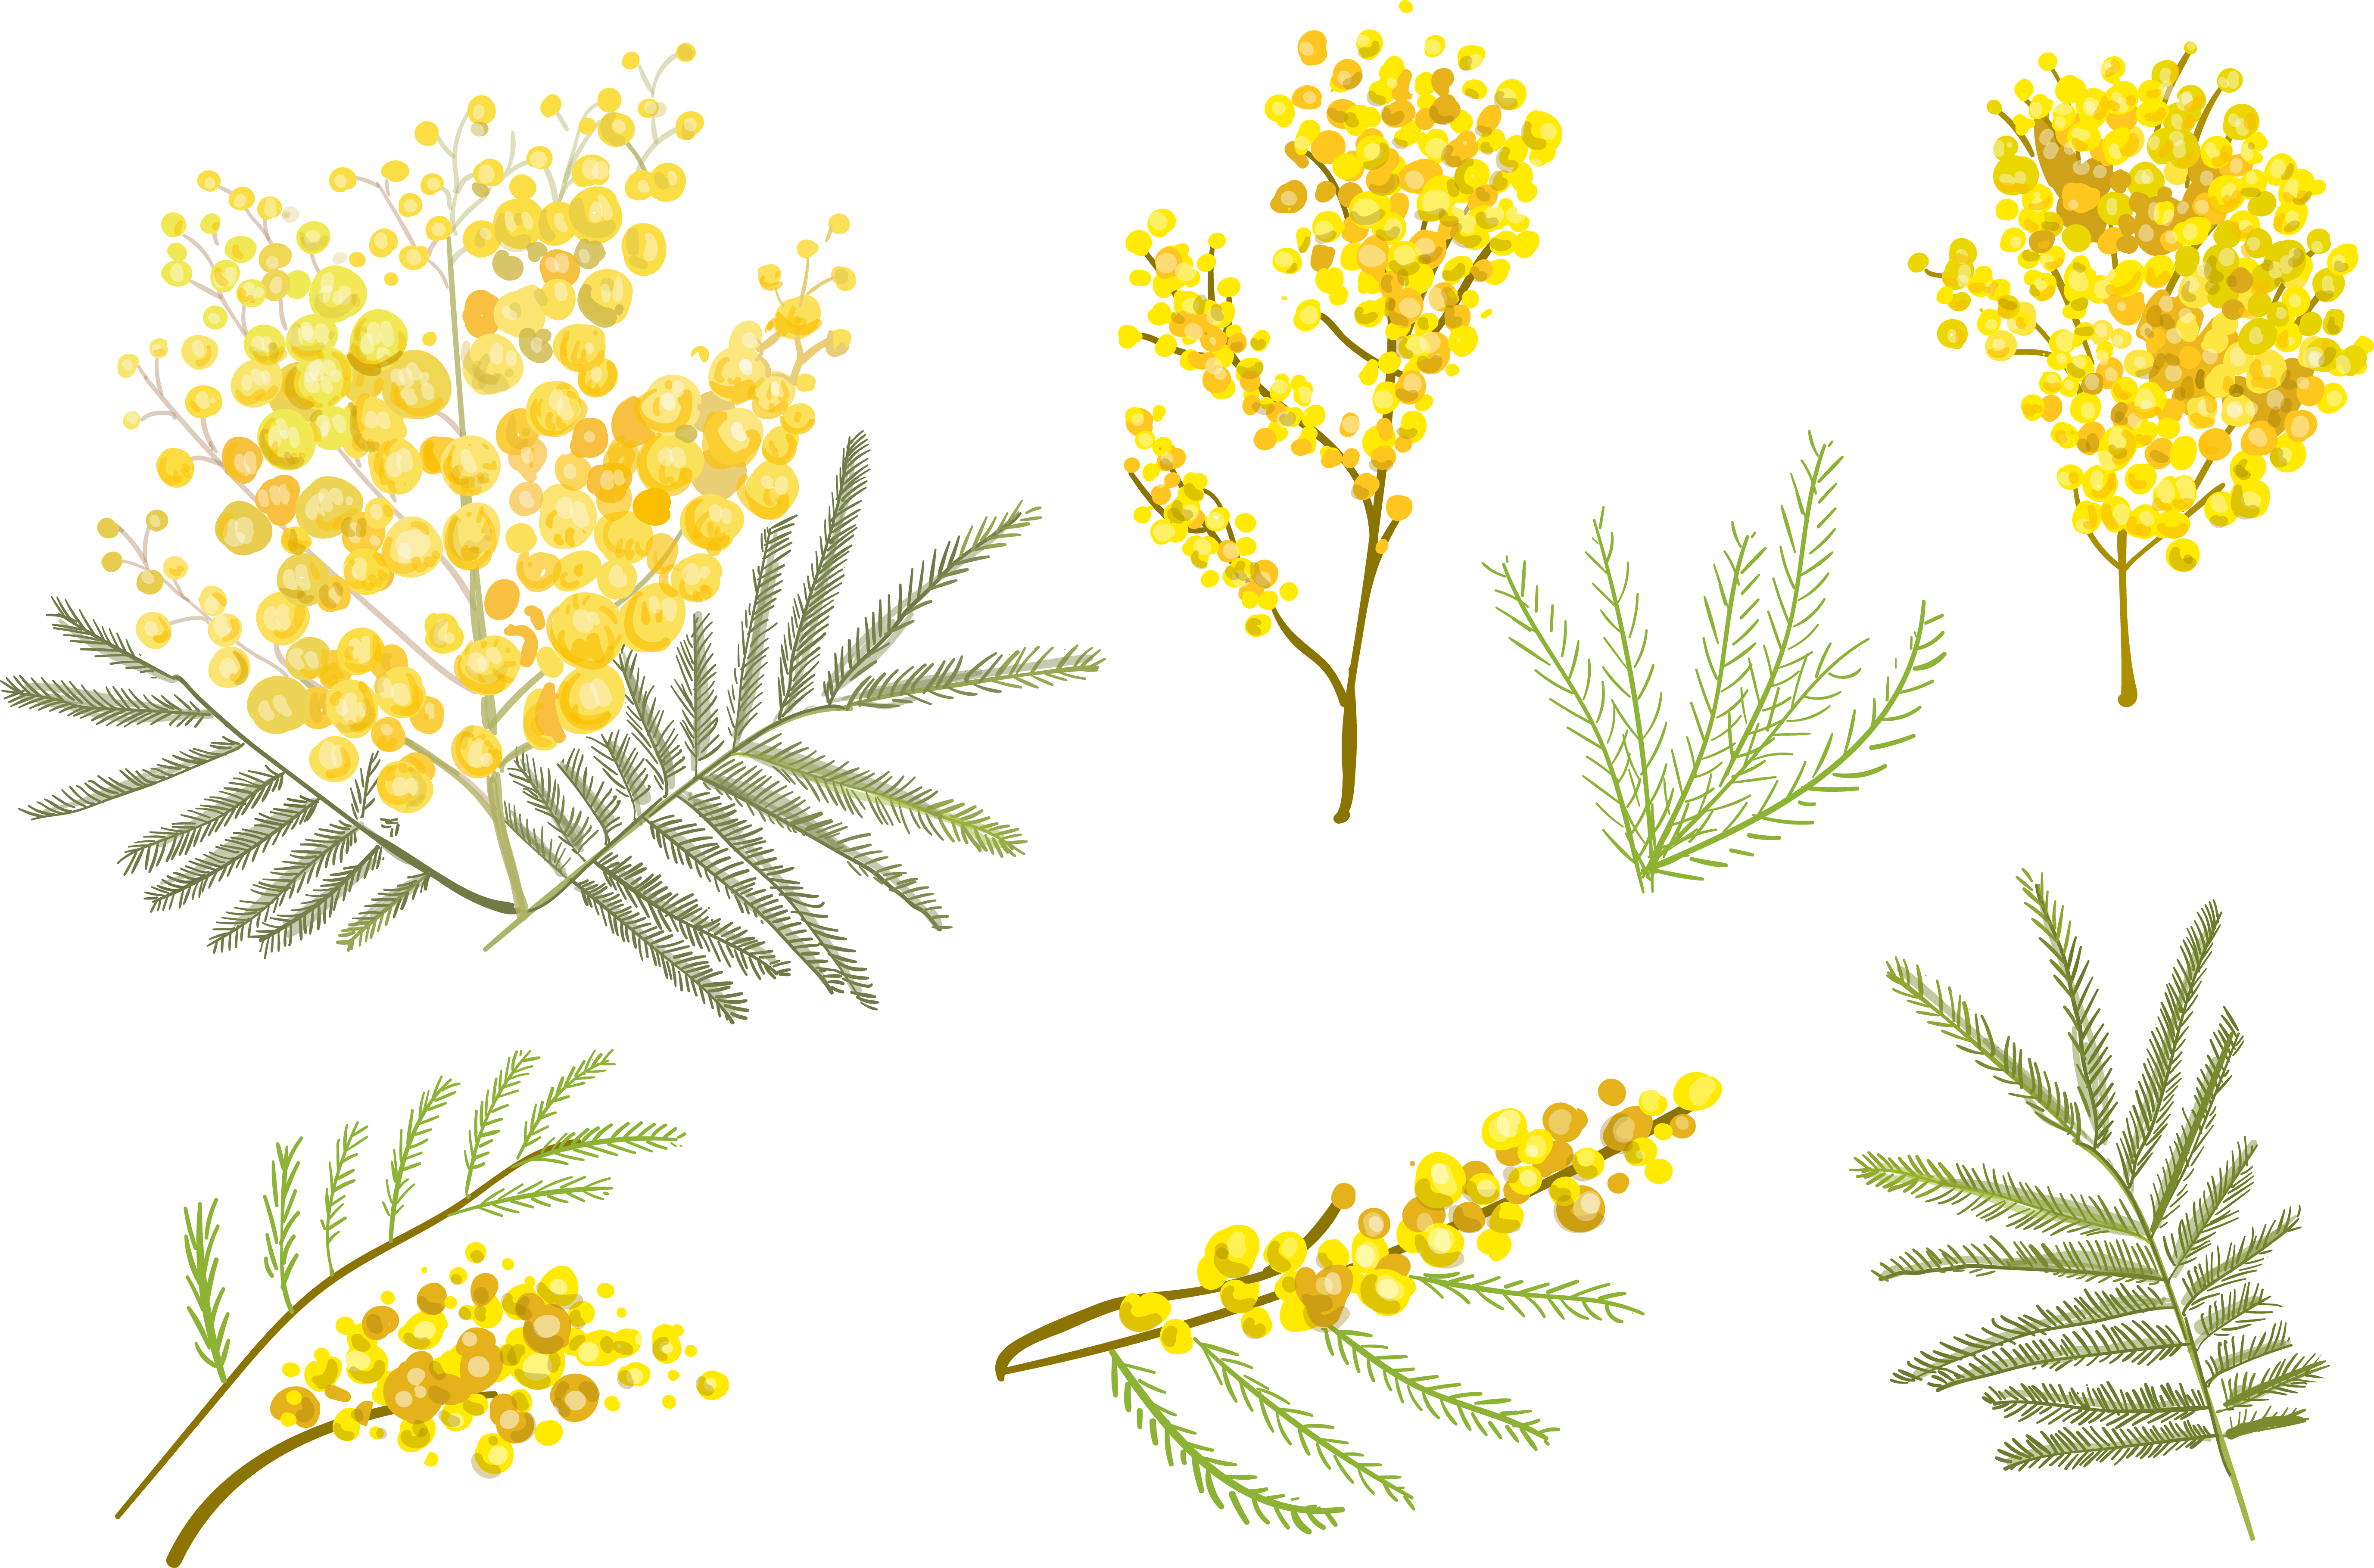 Free flower vector clipart banner black and white Flower Euclidean vector Clip art - Small yellow flower vector 5510 ... banner black and white